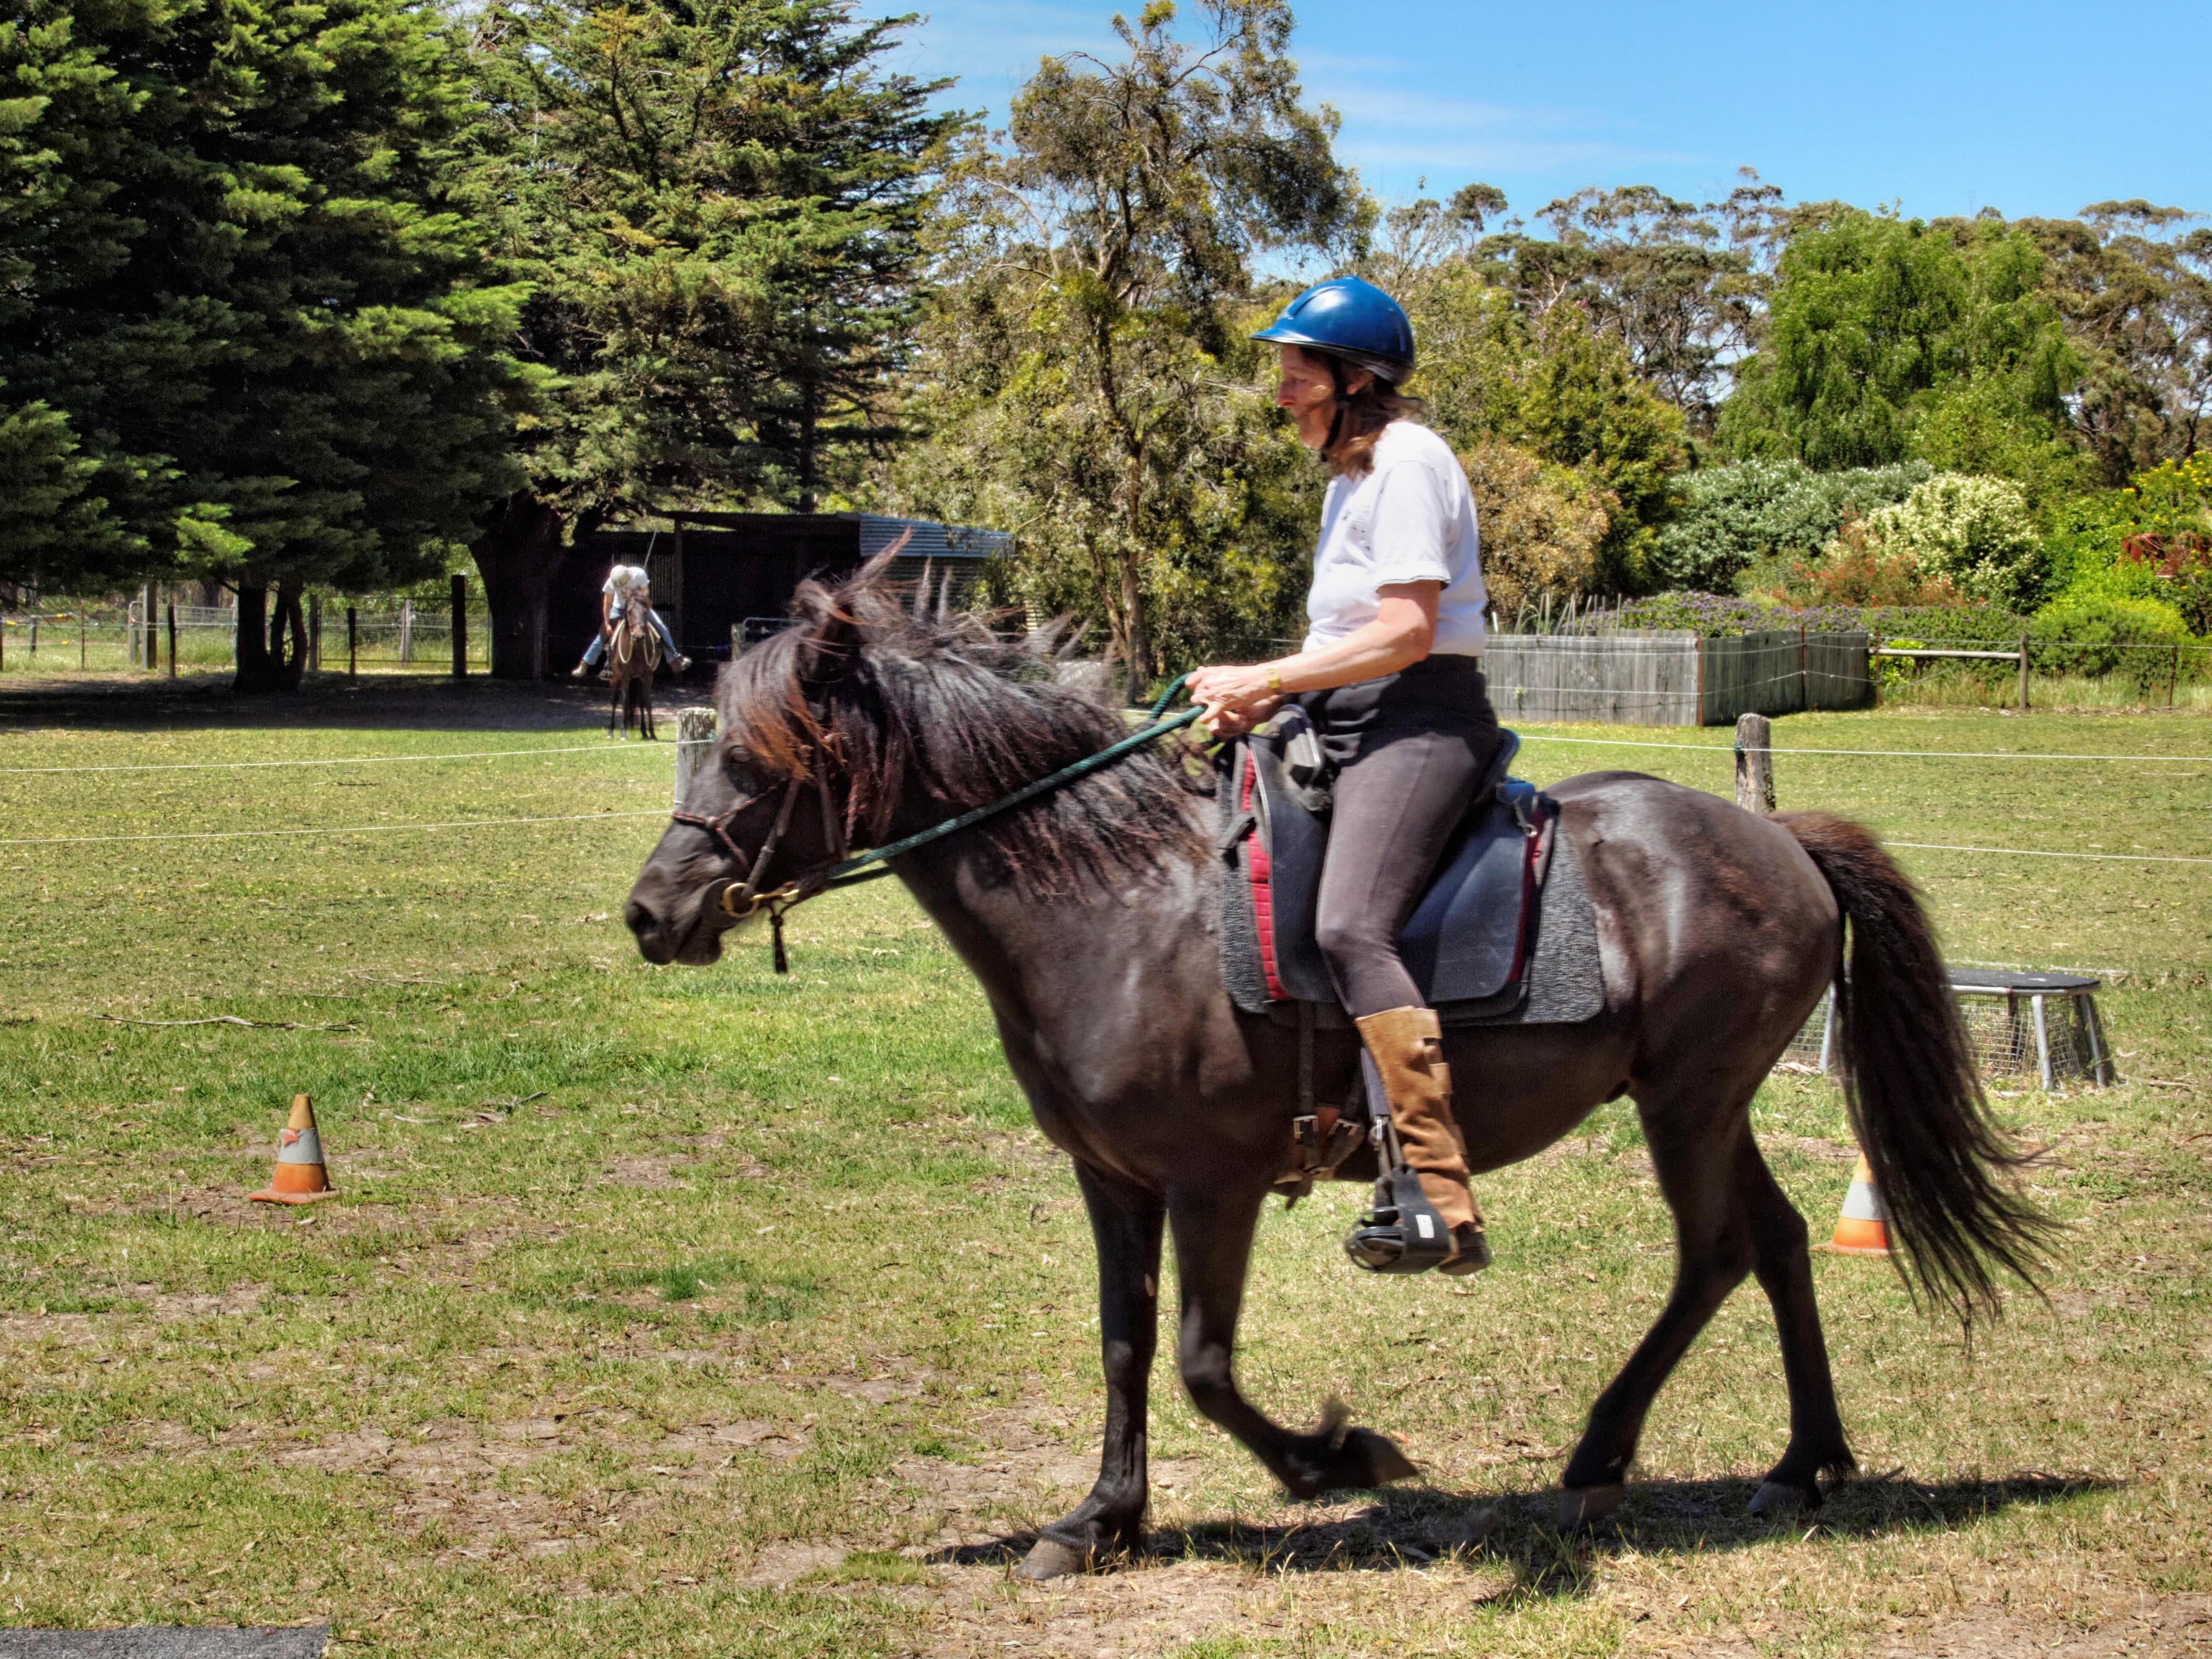 Riding-6.jpeg